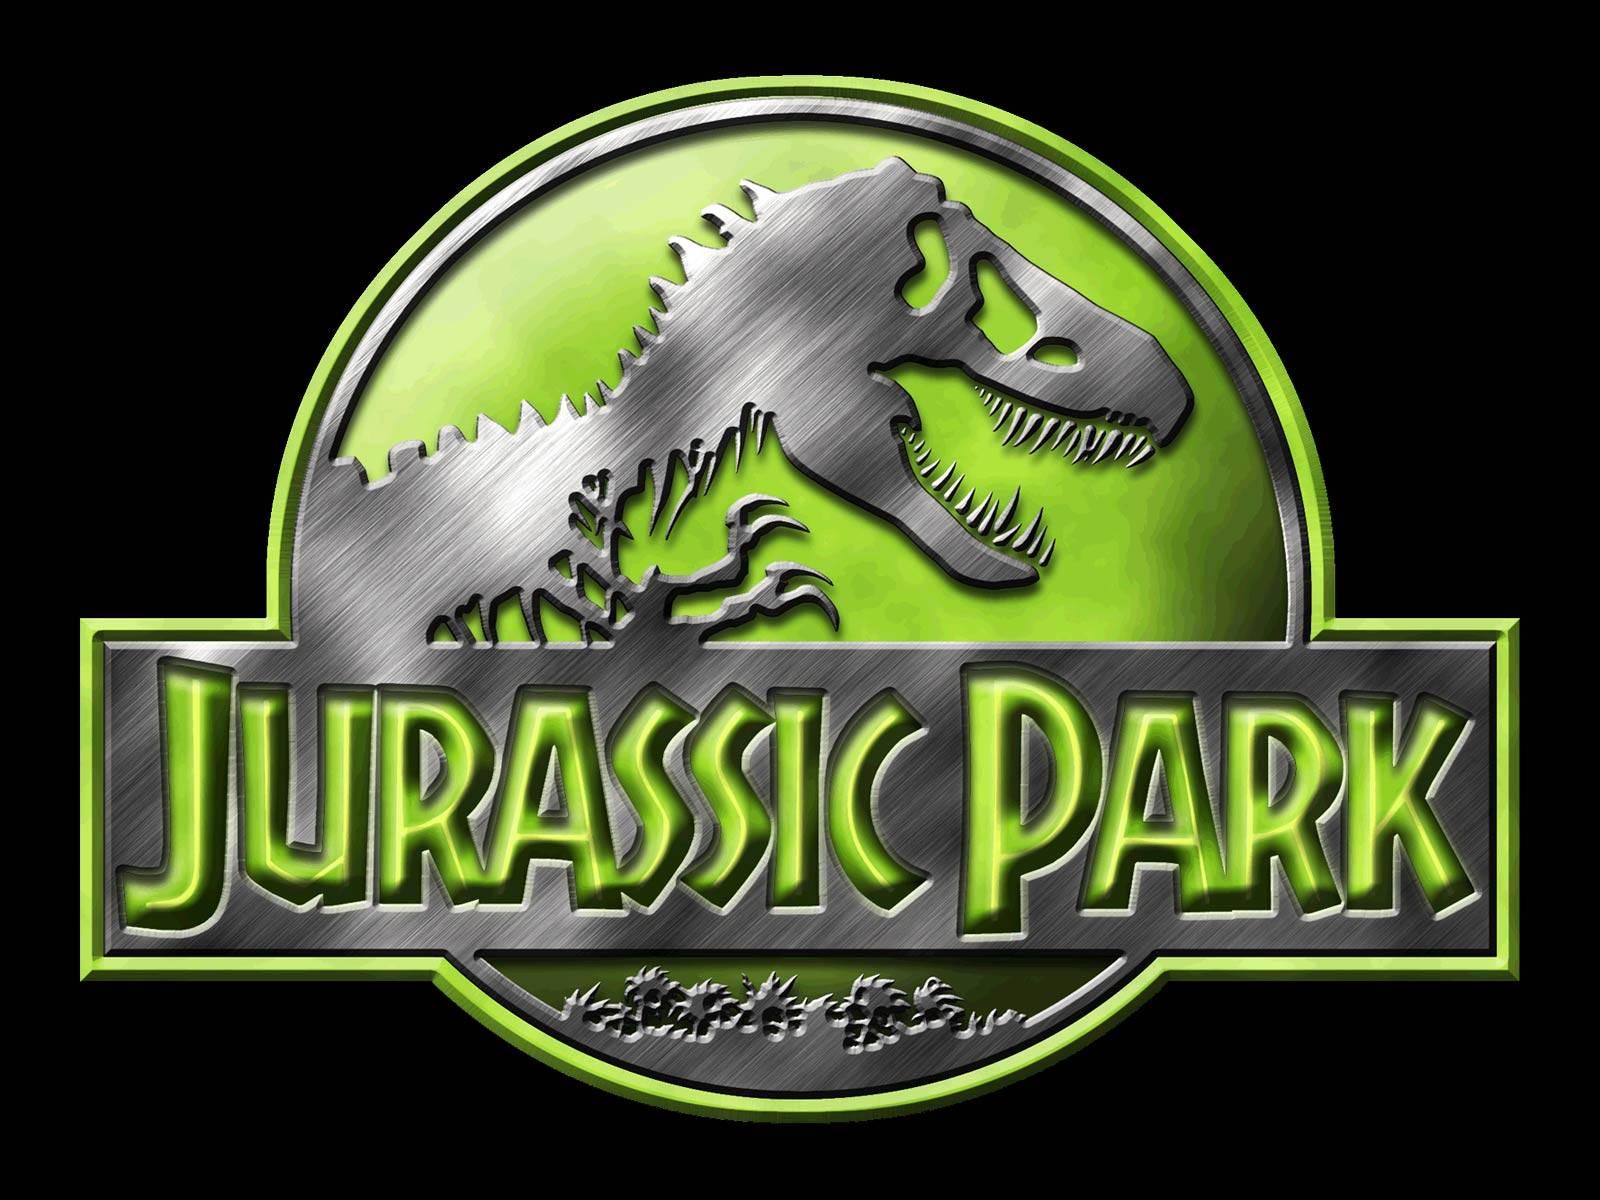 44+ Jurassic Park Logo Wallpaper on WallpaperSafari